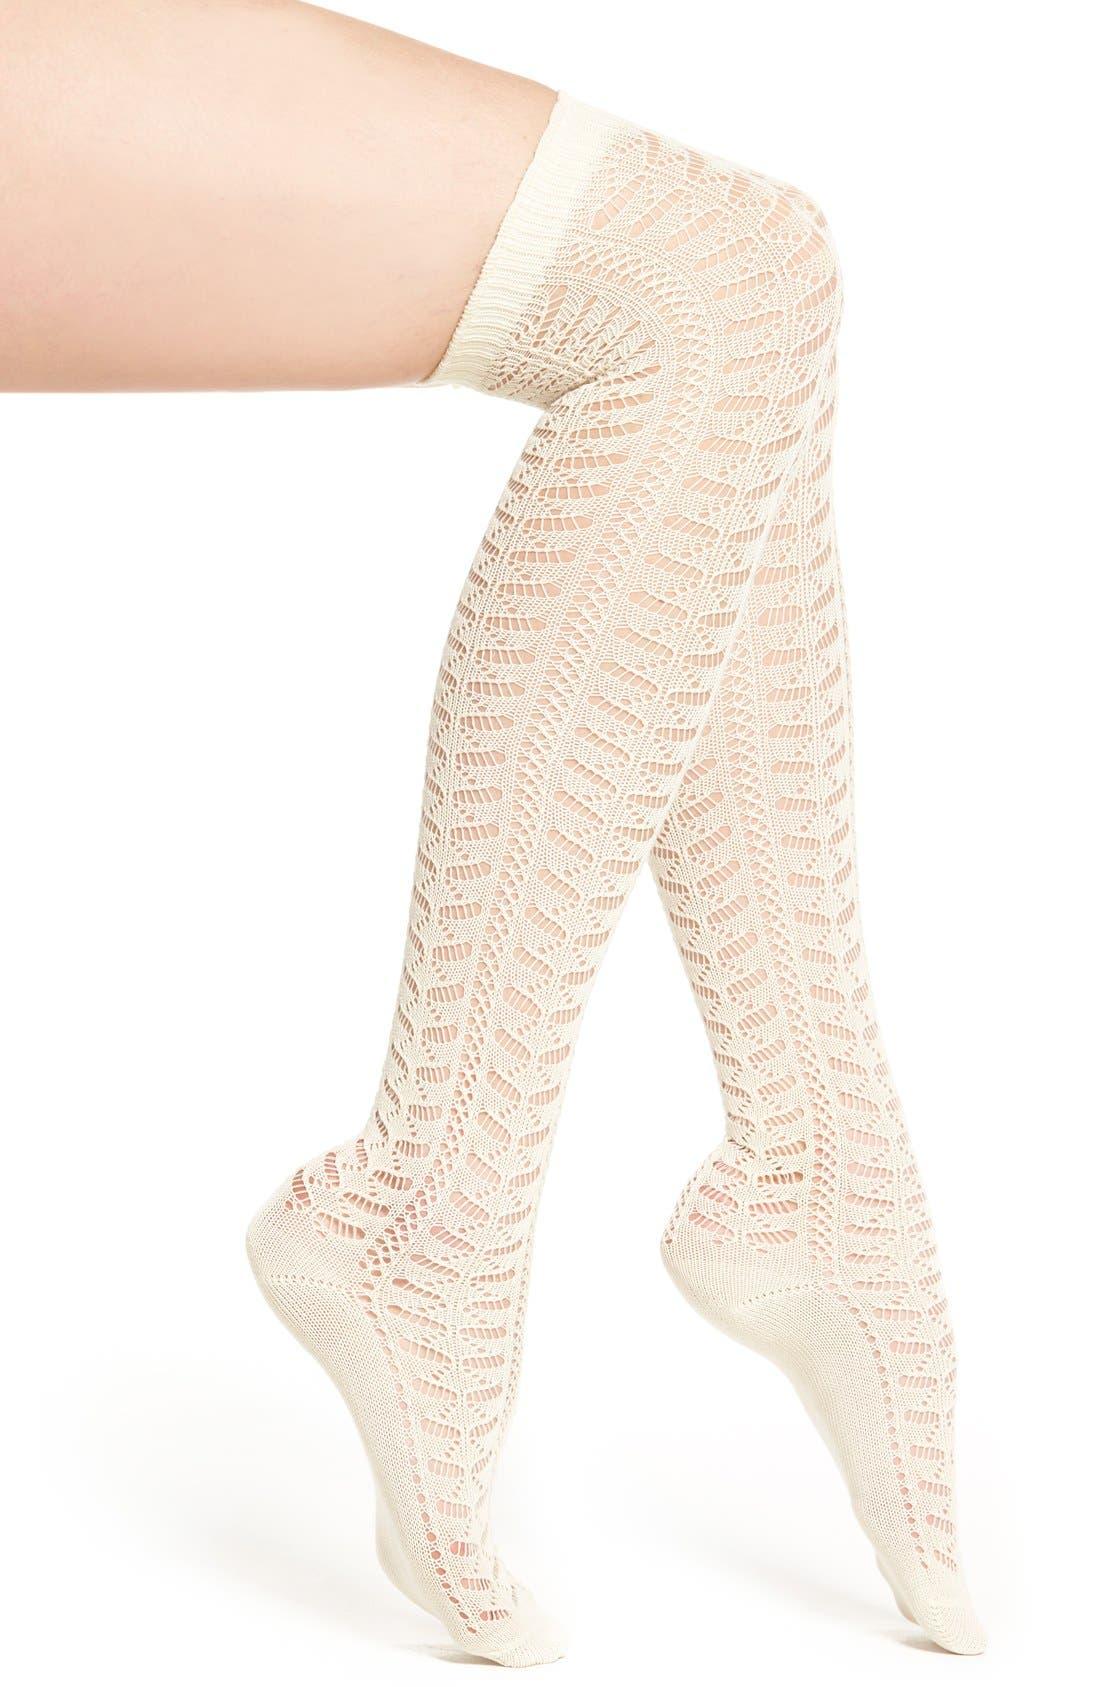 Alternate Image 1 Selected - Nordstrom Openwork Over the Knee Socks